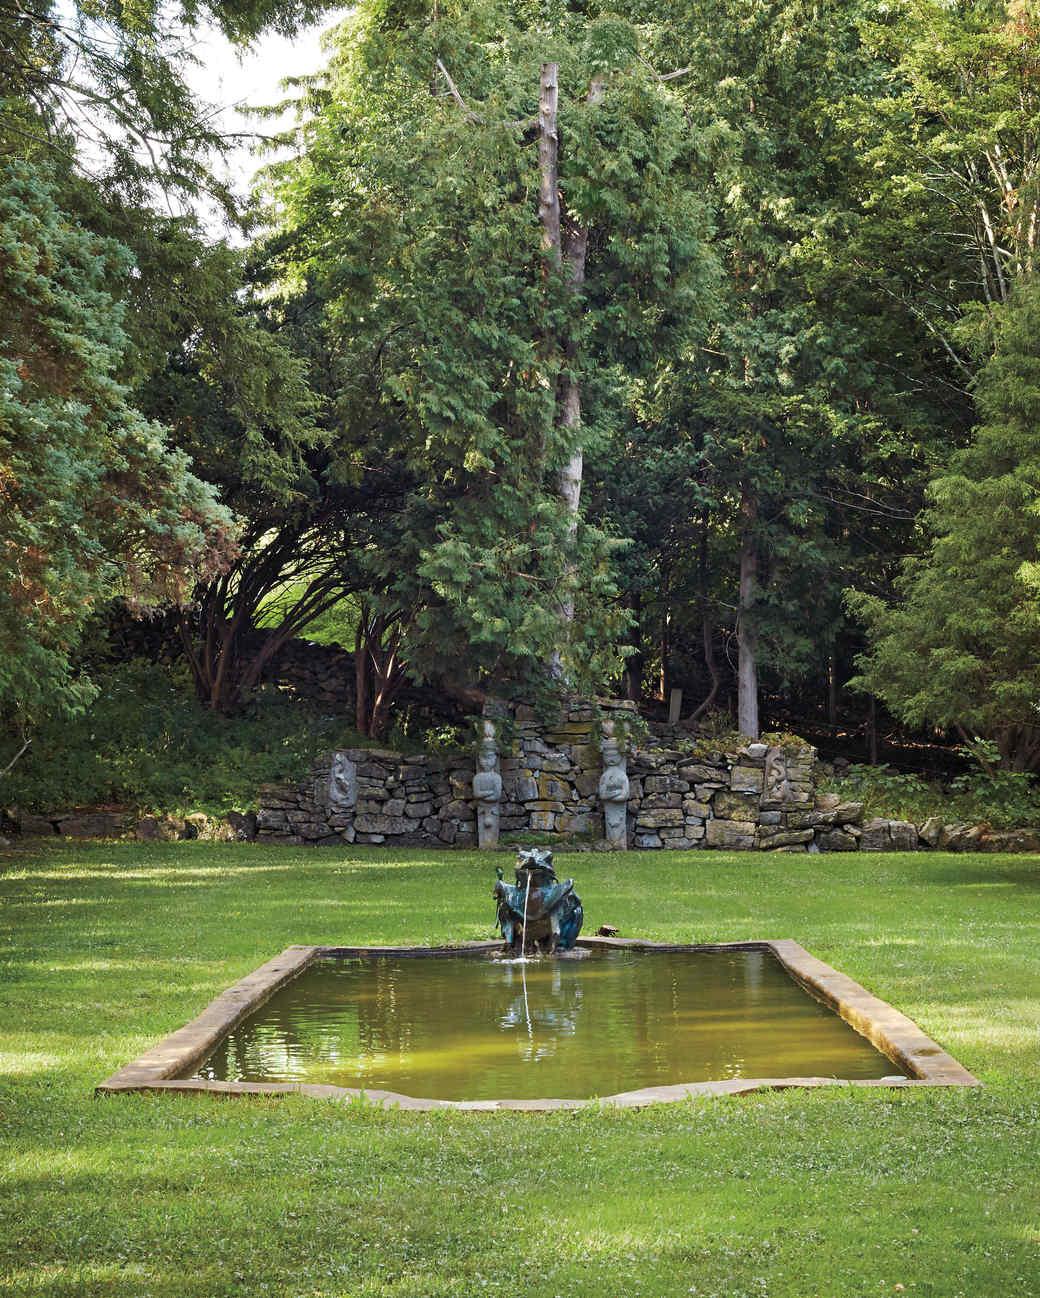 meadowburn-farm-garden-statuary-004-d111449.jpg